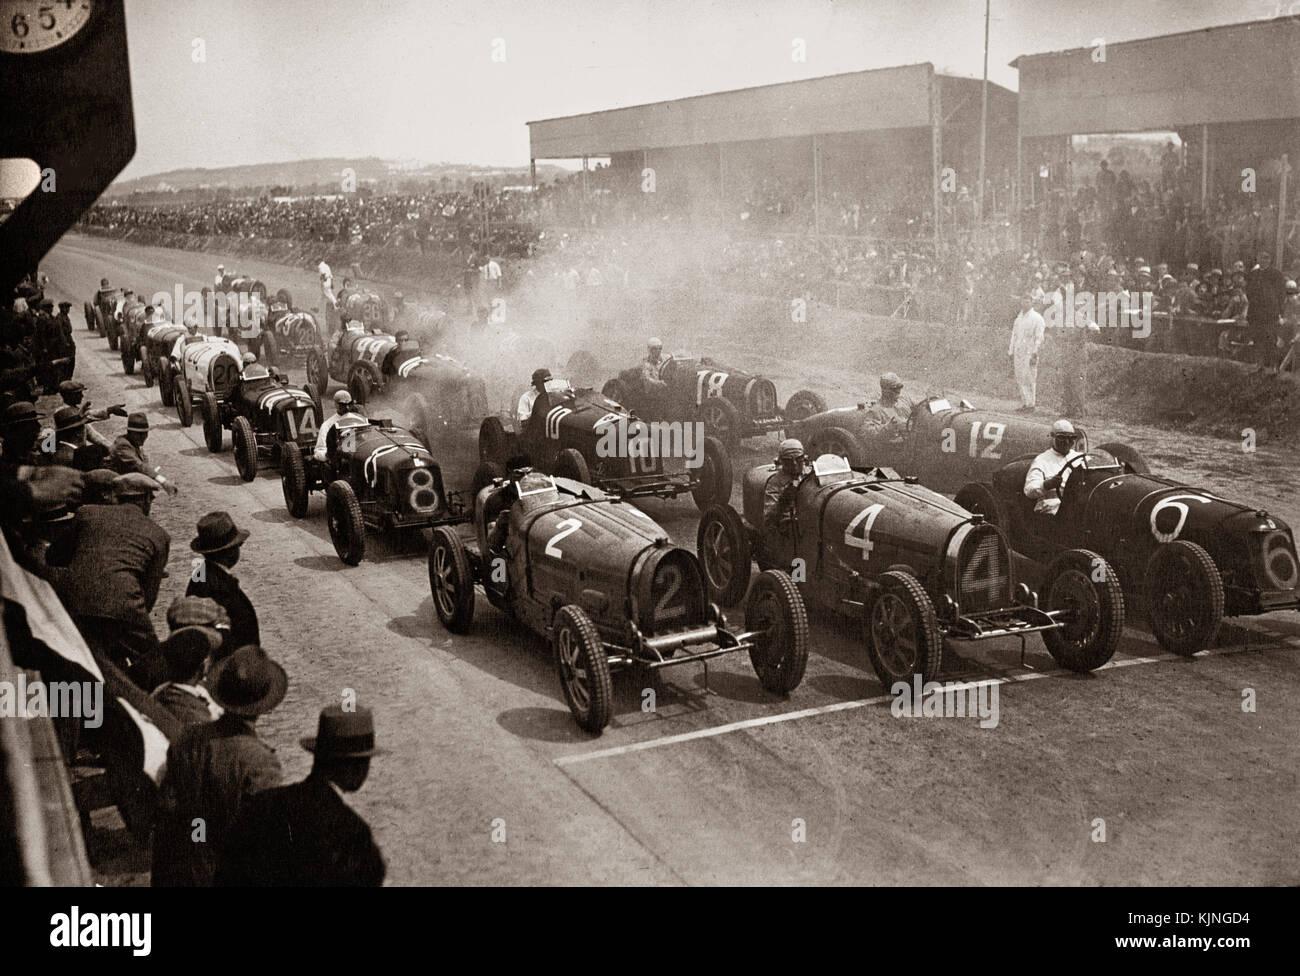 GRAND PRIX 1932 CARTHAGE TUNIS Historic motor racing grid start at the 1932 Tunis Grand Prix B&W archive image - Stock Image